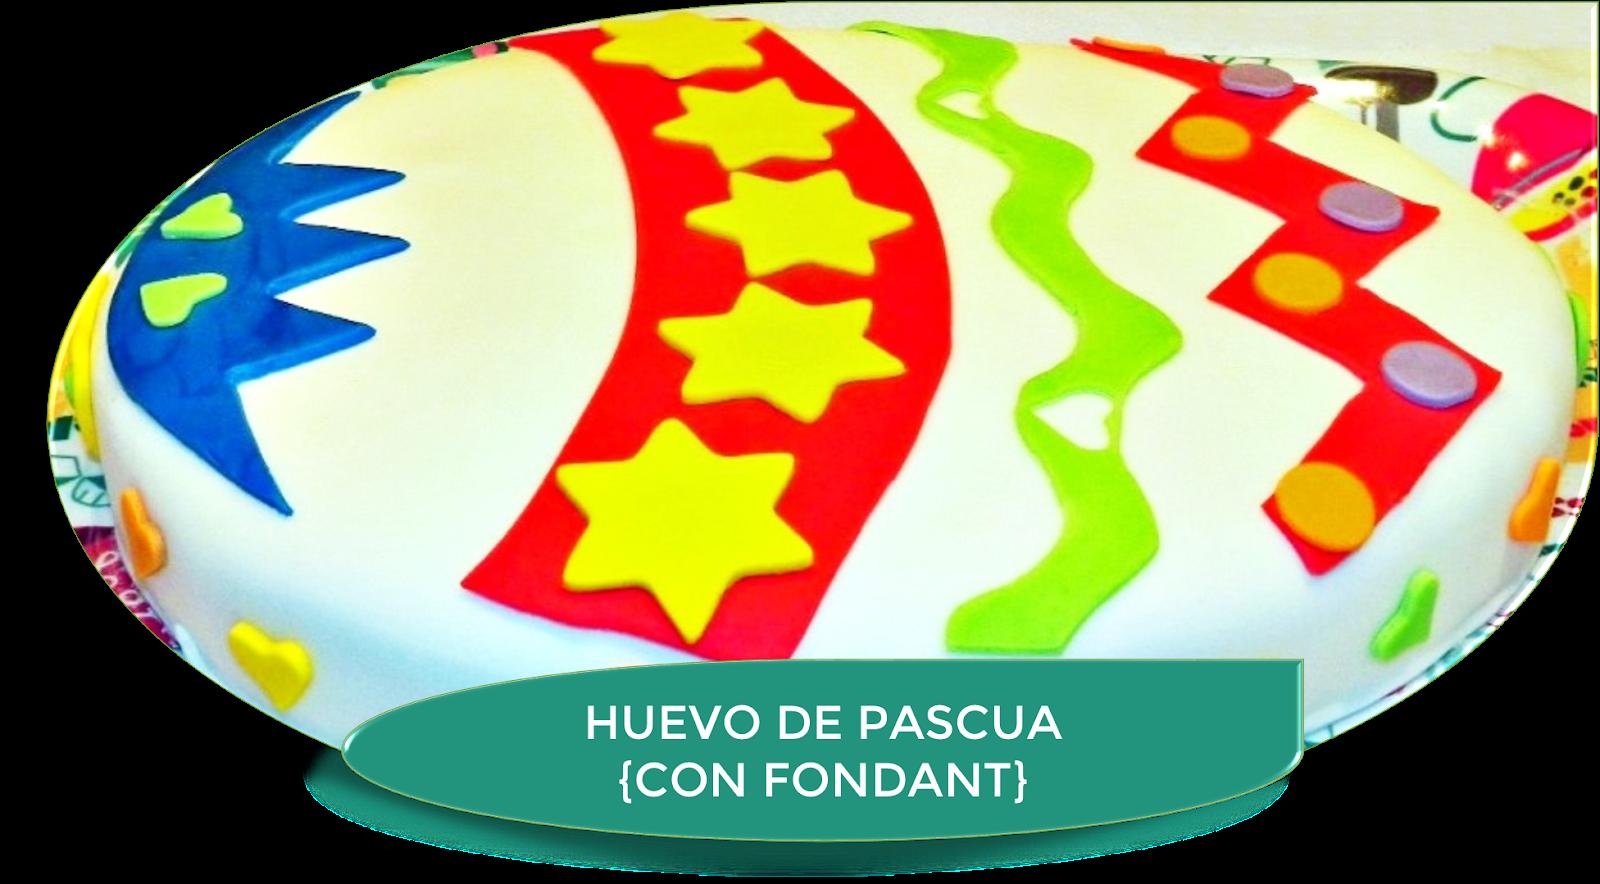 TARTA FONDANT HUEVO DE PASCUA {MONA DE PASCUA}